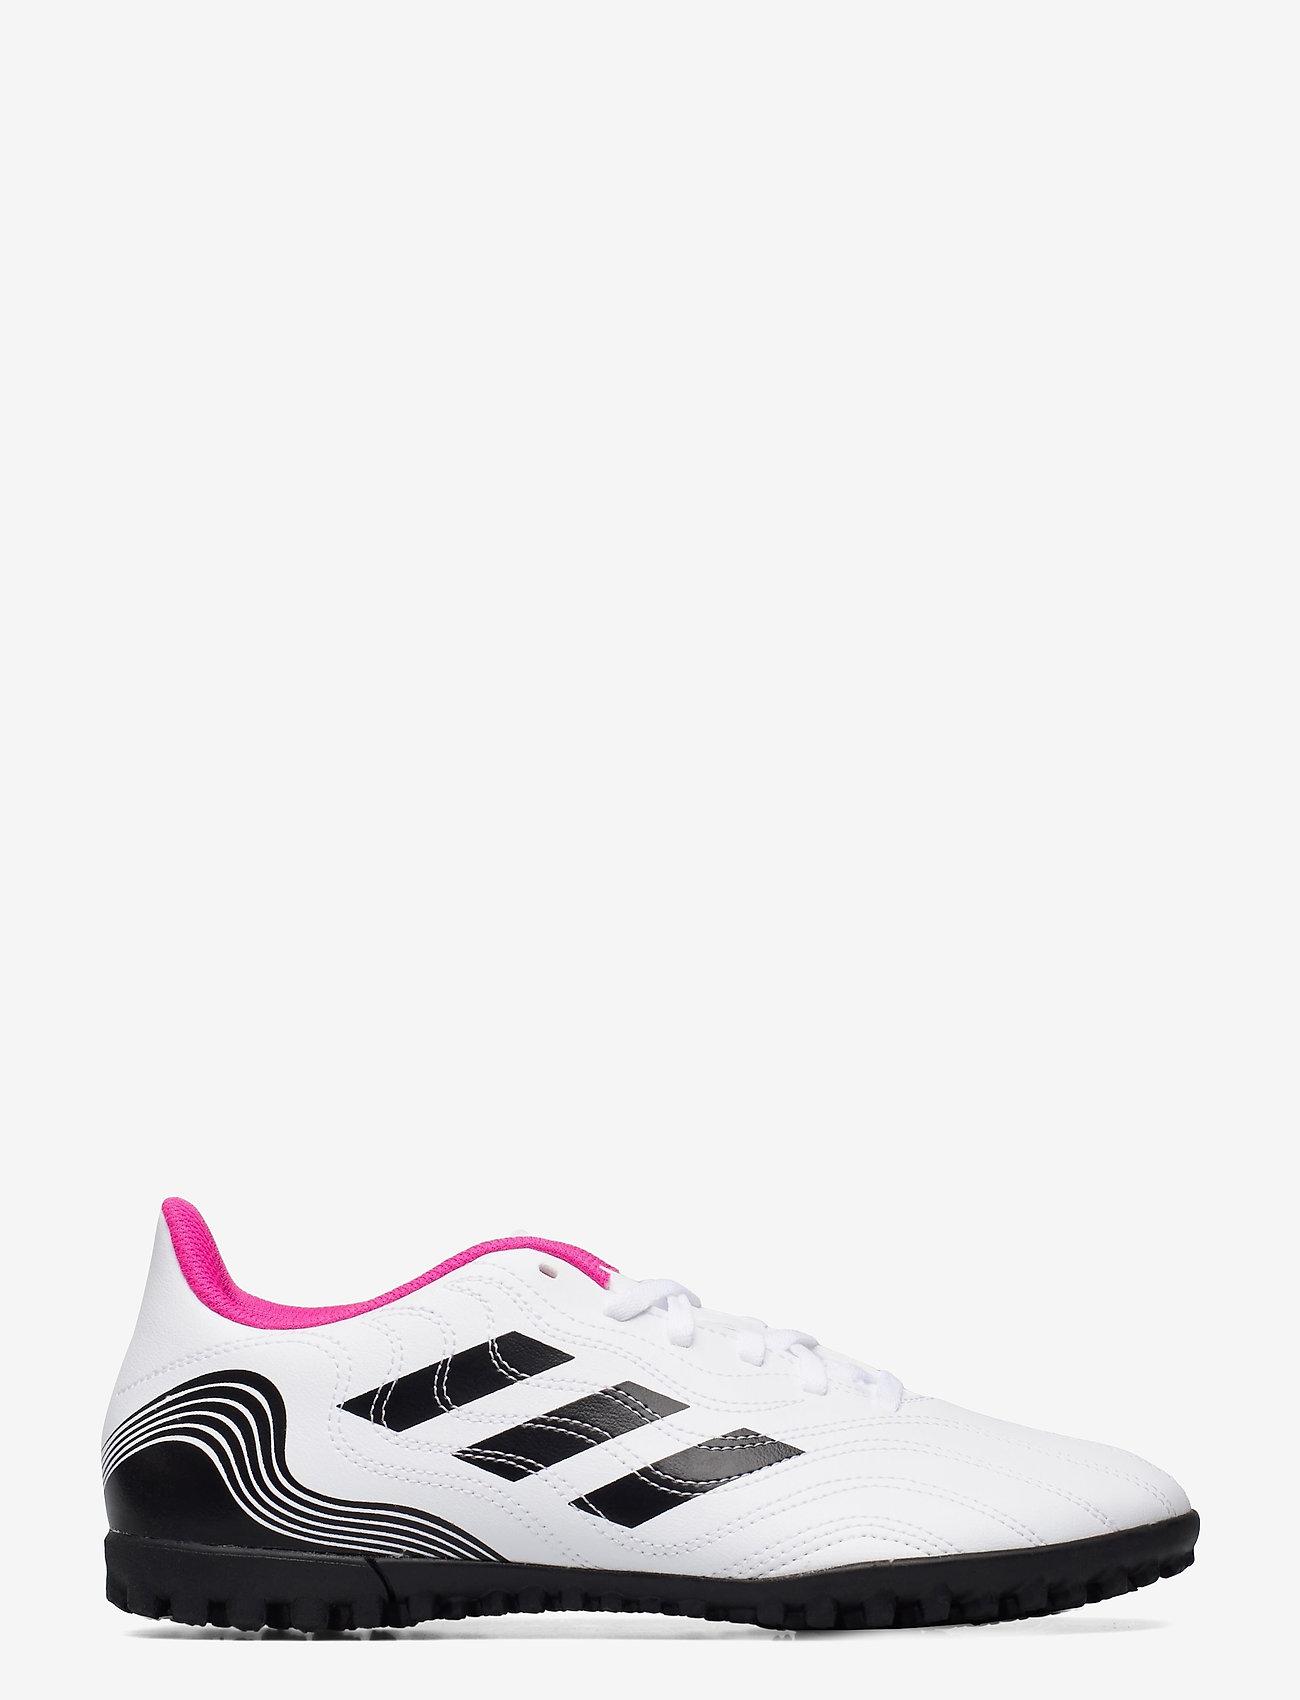 adidas Performance - Copa Sense.4 Turf Boots - fodboldsko - ftwwht/cblack/shopnk - 0